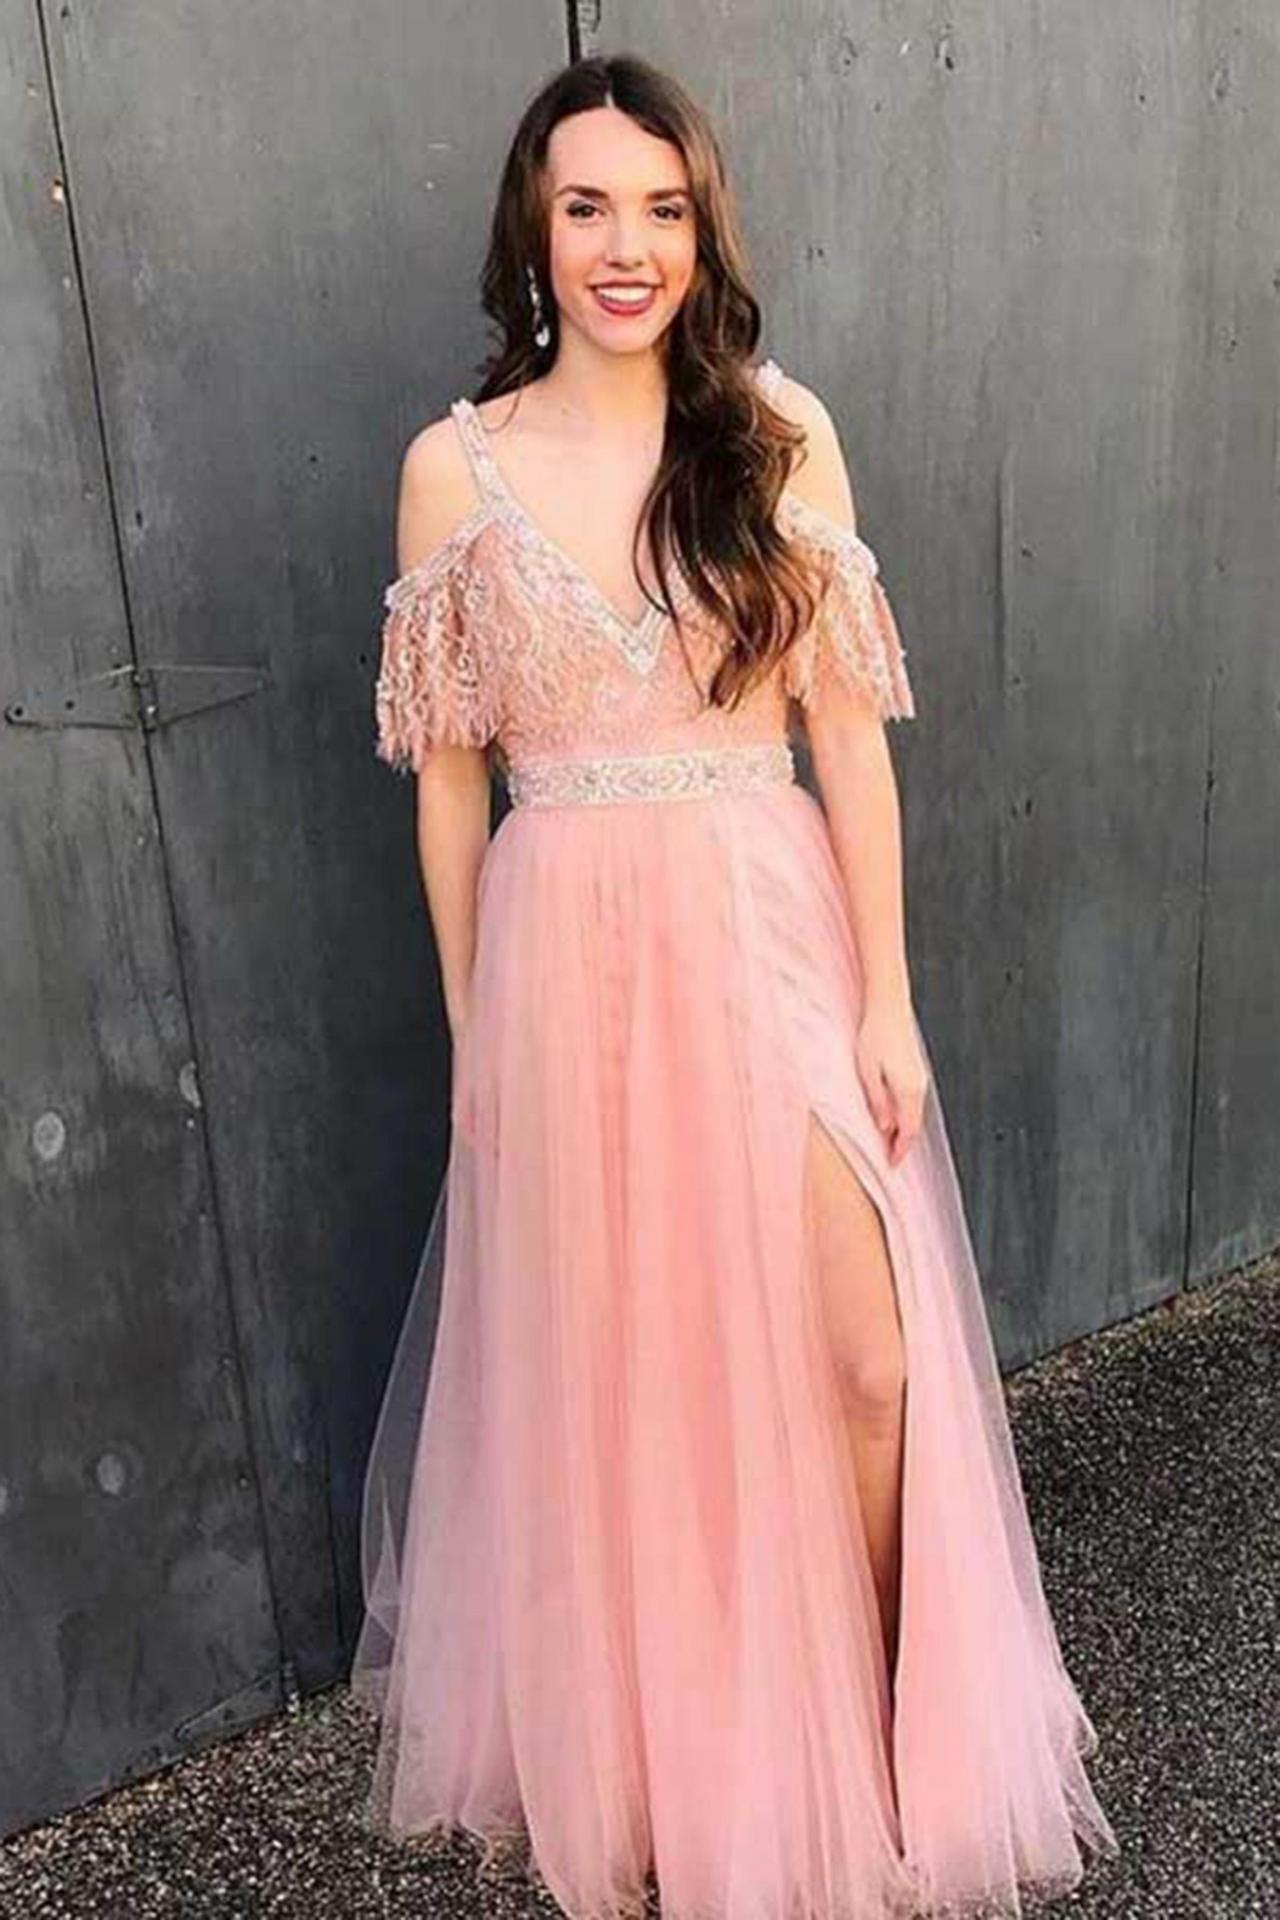 Split Side Pink Beaded Prom Dresses Elegant Long Homecoming Dress Formal Evening Dress Lace Evening Dresses Off Shoulder Evening Dress Homecoming Dresses Long [ 1920 x 1280 Pixel ]